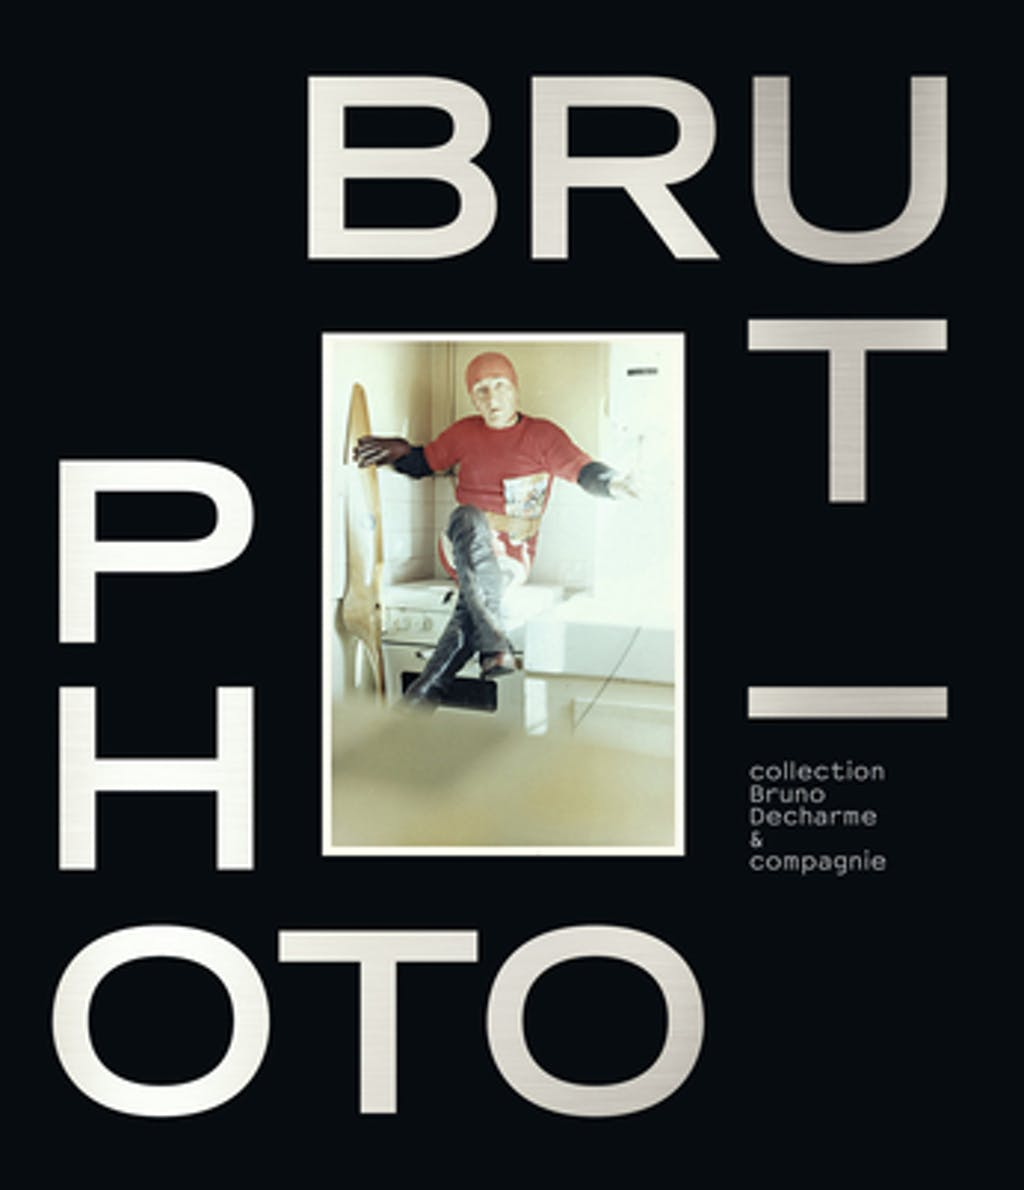 Photo Brut - © christian berst — art brut